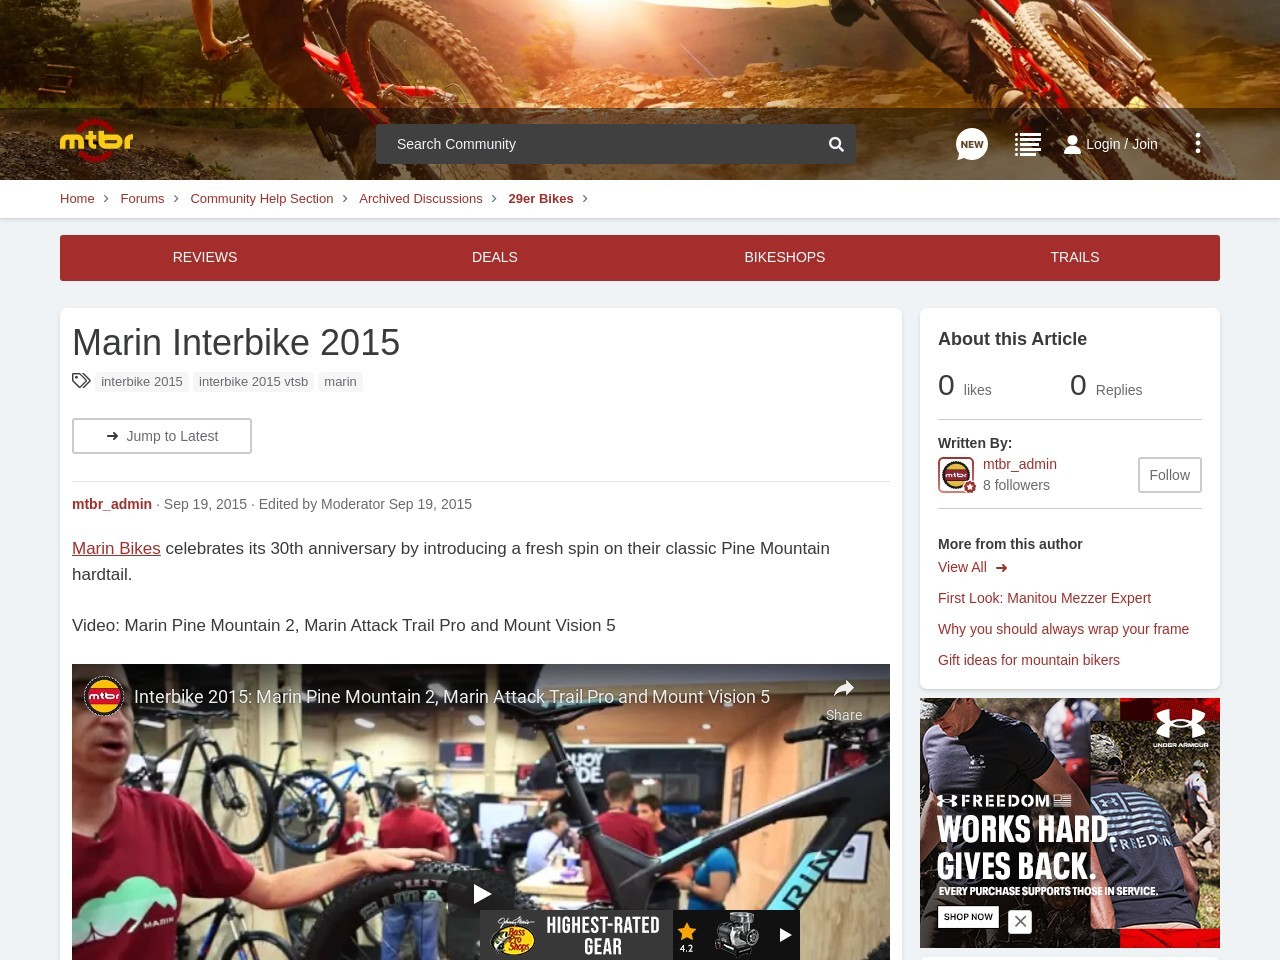 Marin Interbike 2015 – Mtbr.com